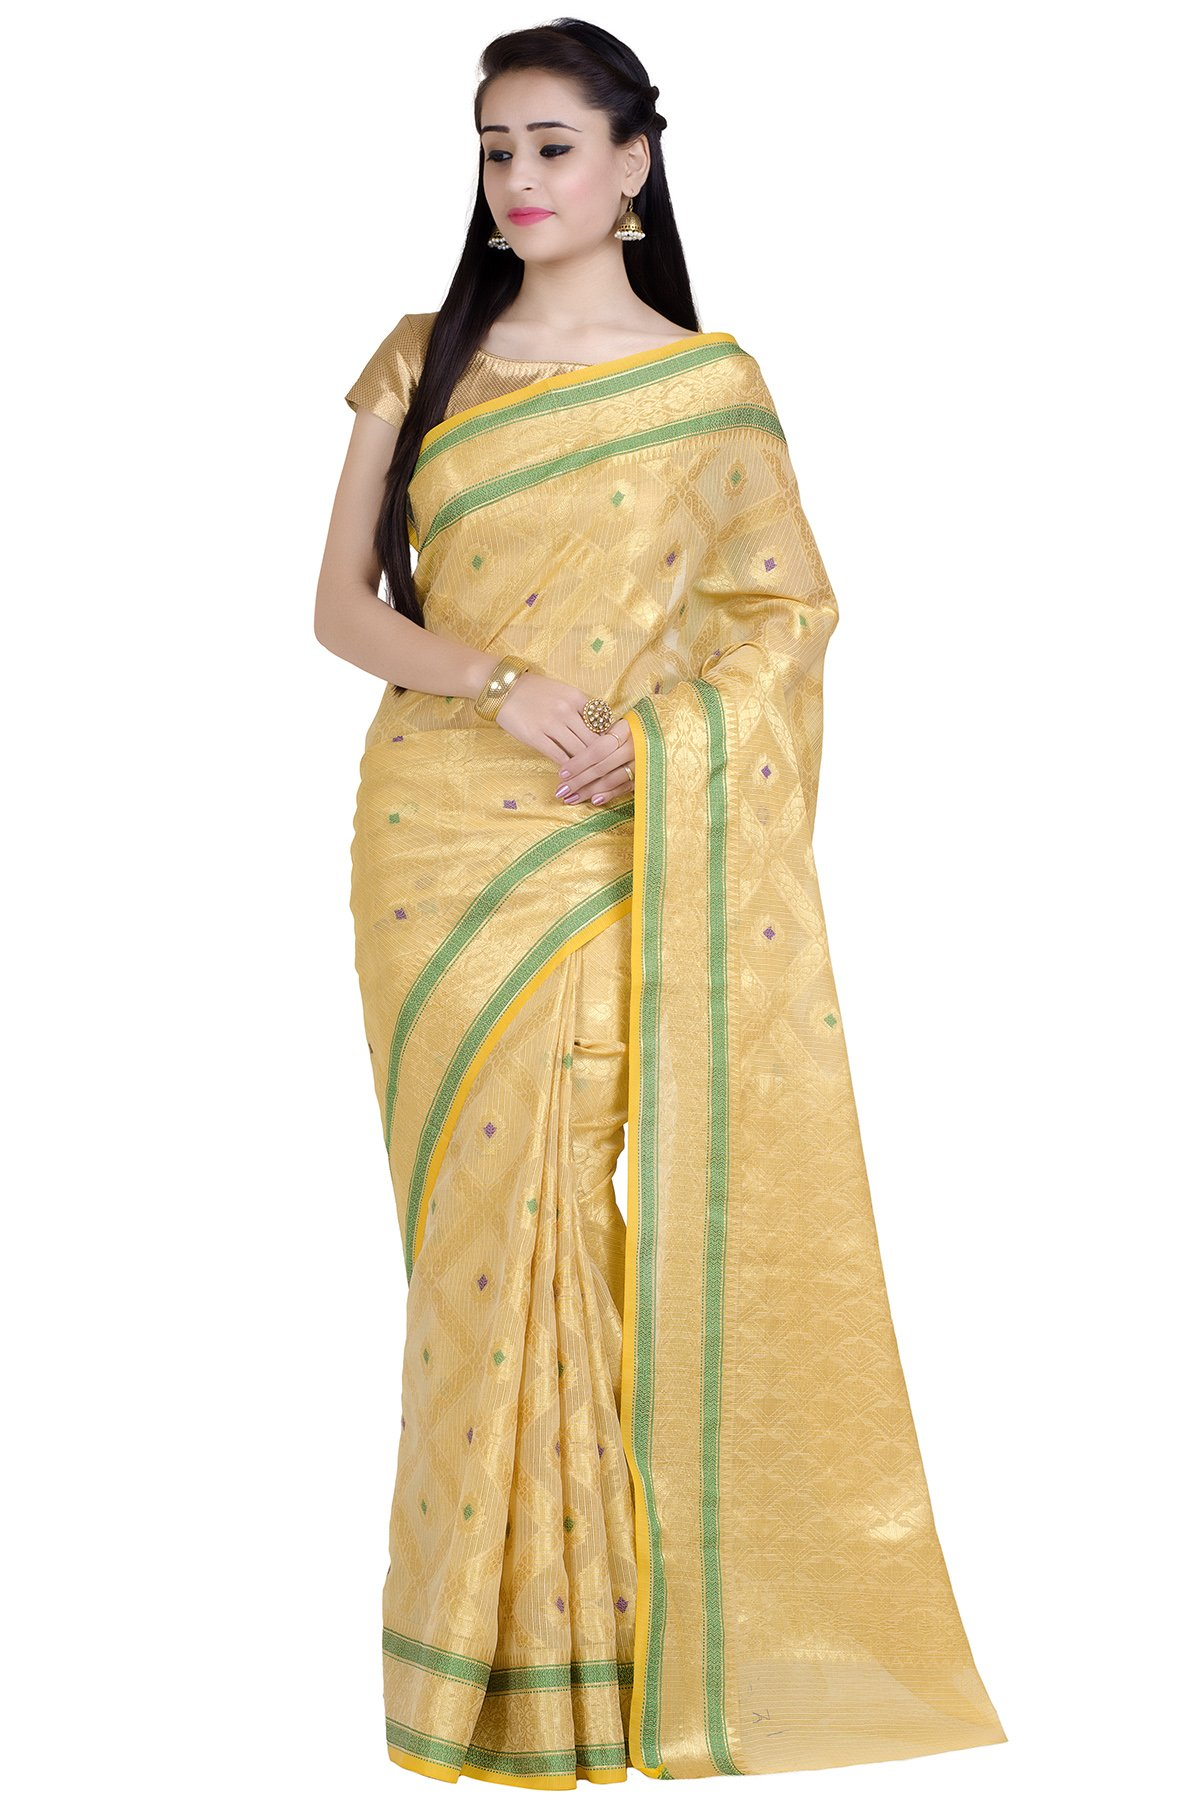 Chandrakala Women's Beige Supernet Cotton Banarasi Saree(1275BEI)